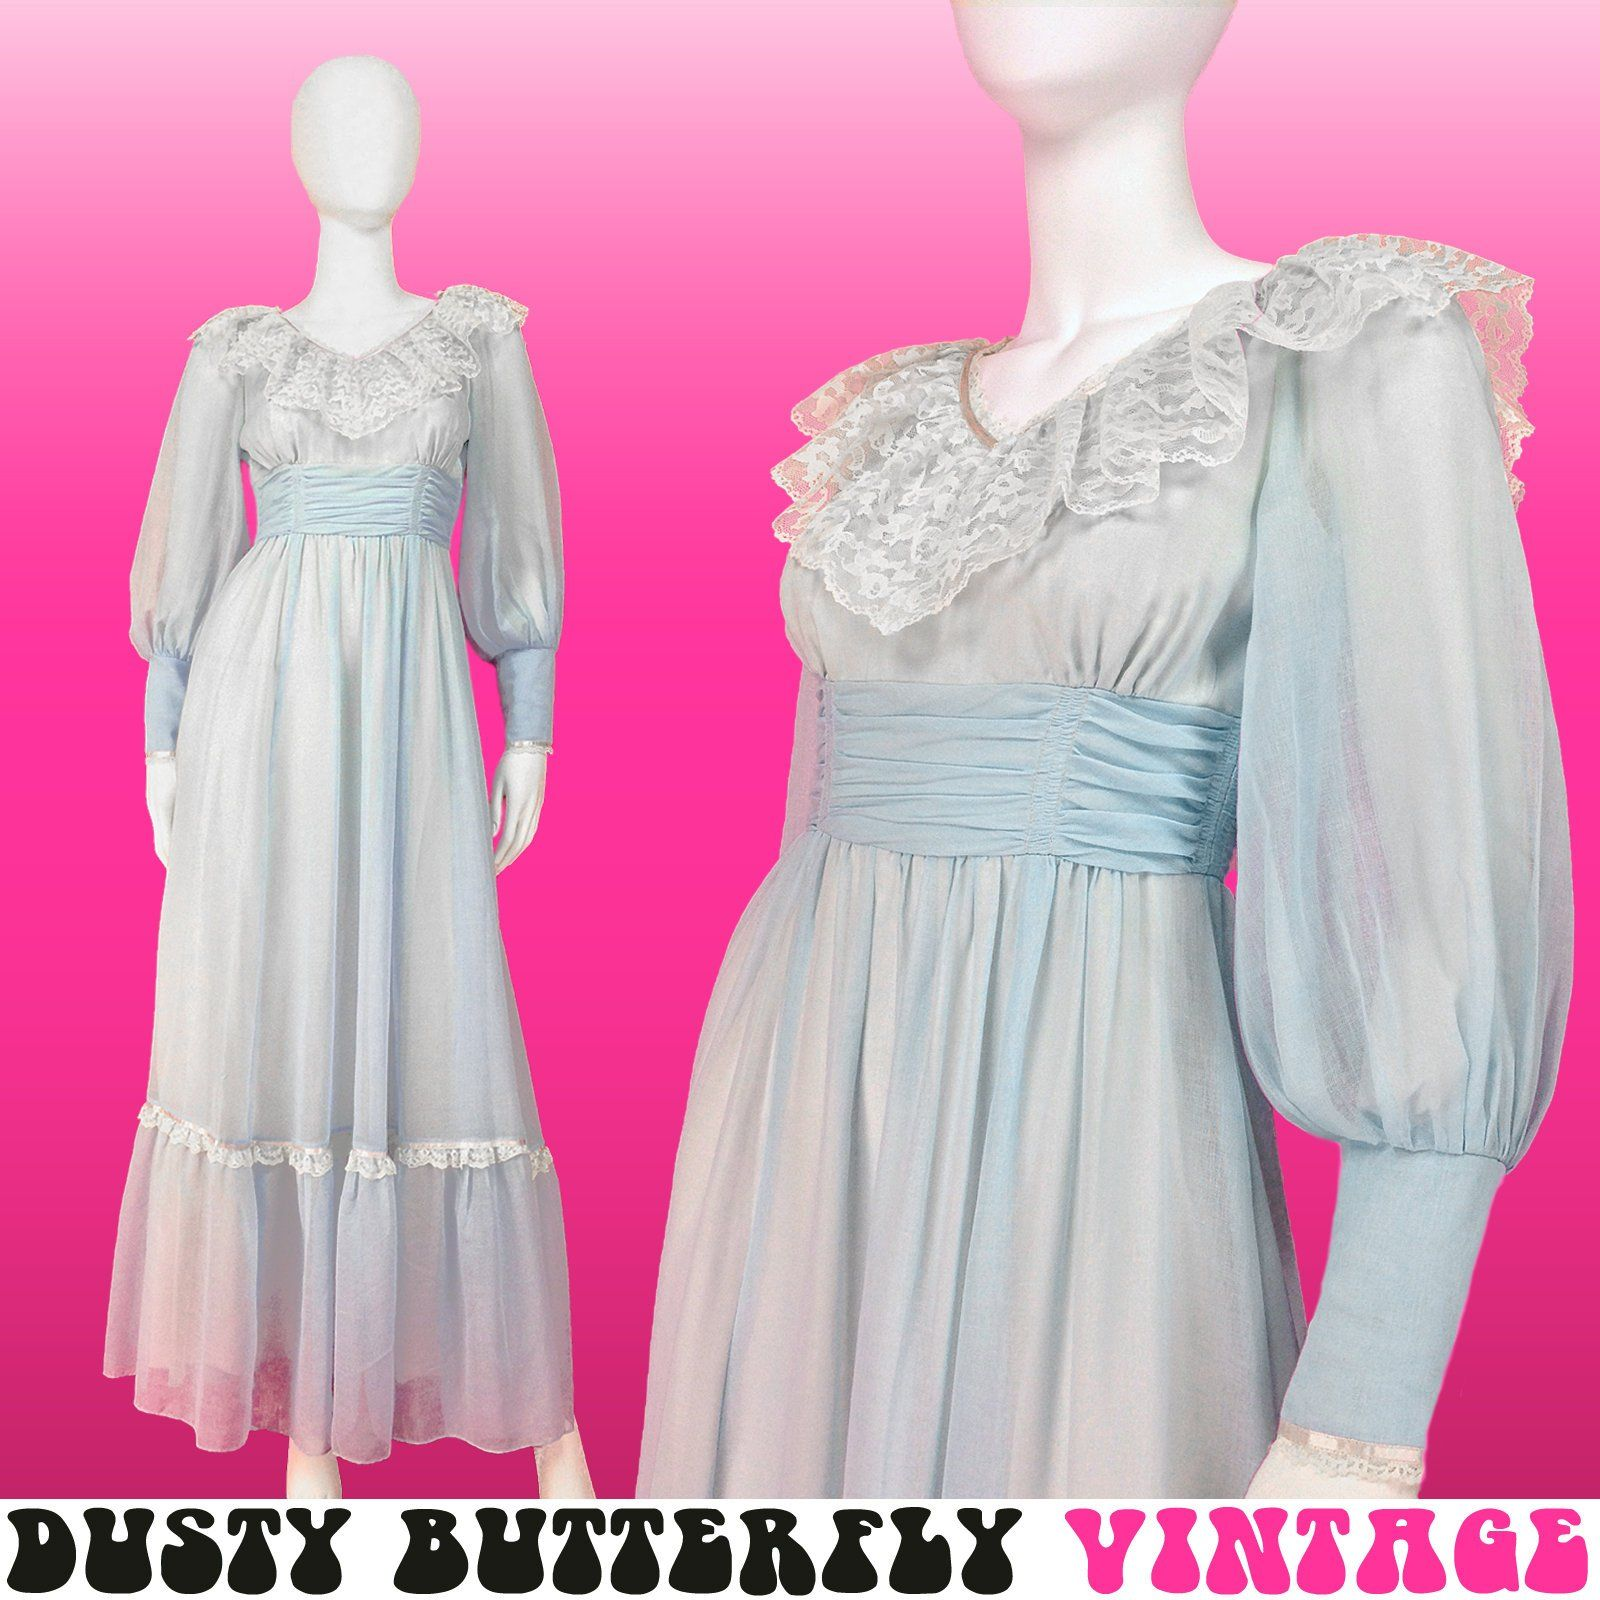 Vintage Long Prom Dress Xxs Xs 70s Maxi Dress Pastel Baby Blue Gunne Sax Style Bishop Sleeves Weddin Prom Dresses Vintage 70s Maxi Dress Prom Dresses 70s [ 1600 x 1600 Pixel ]